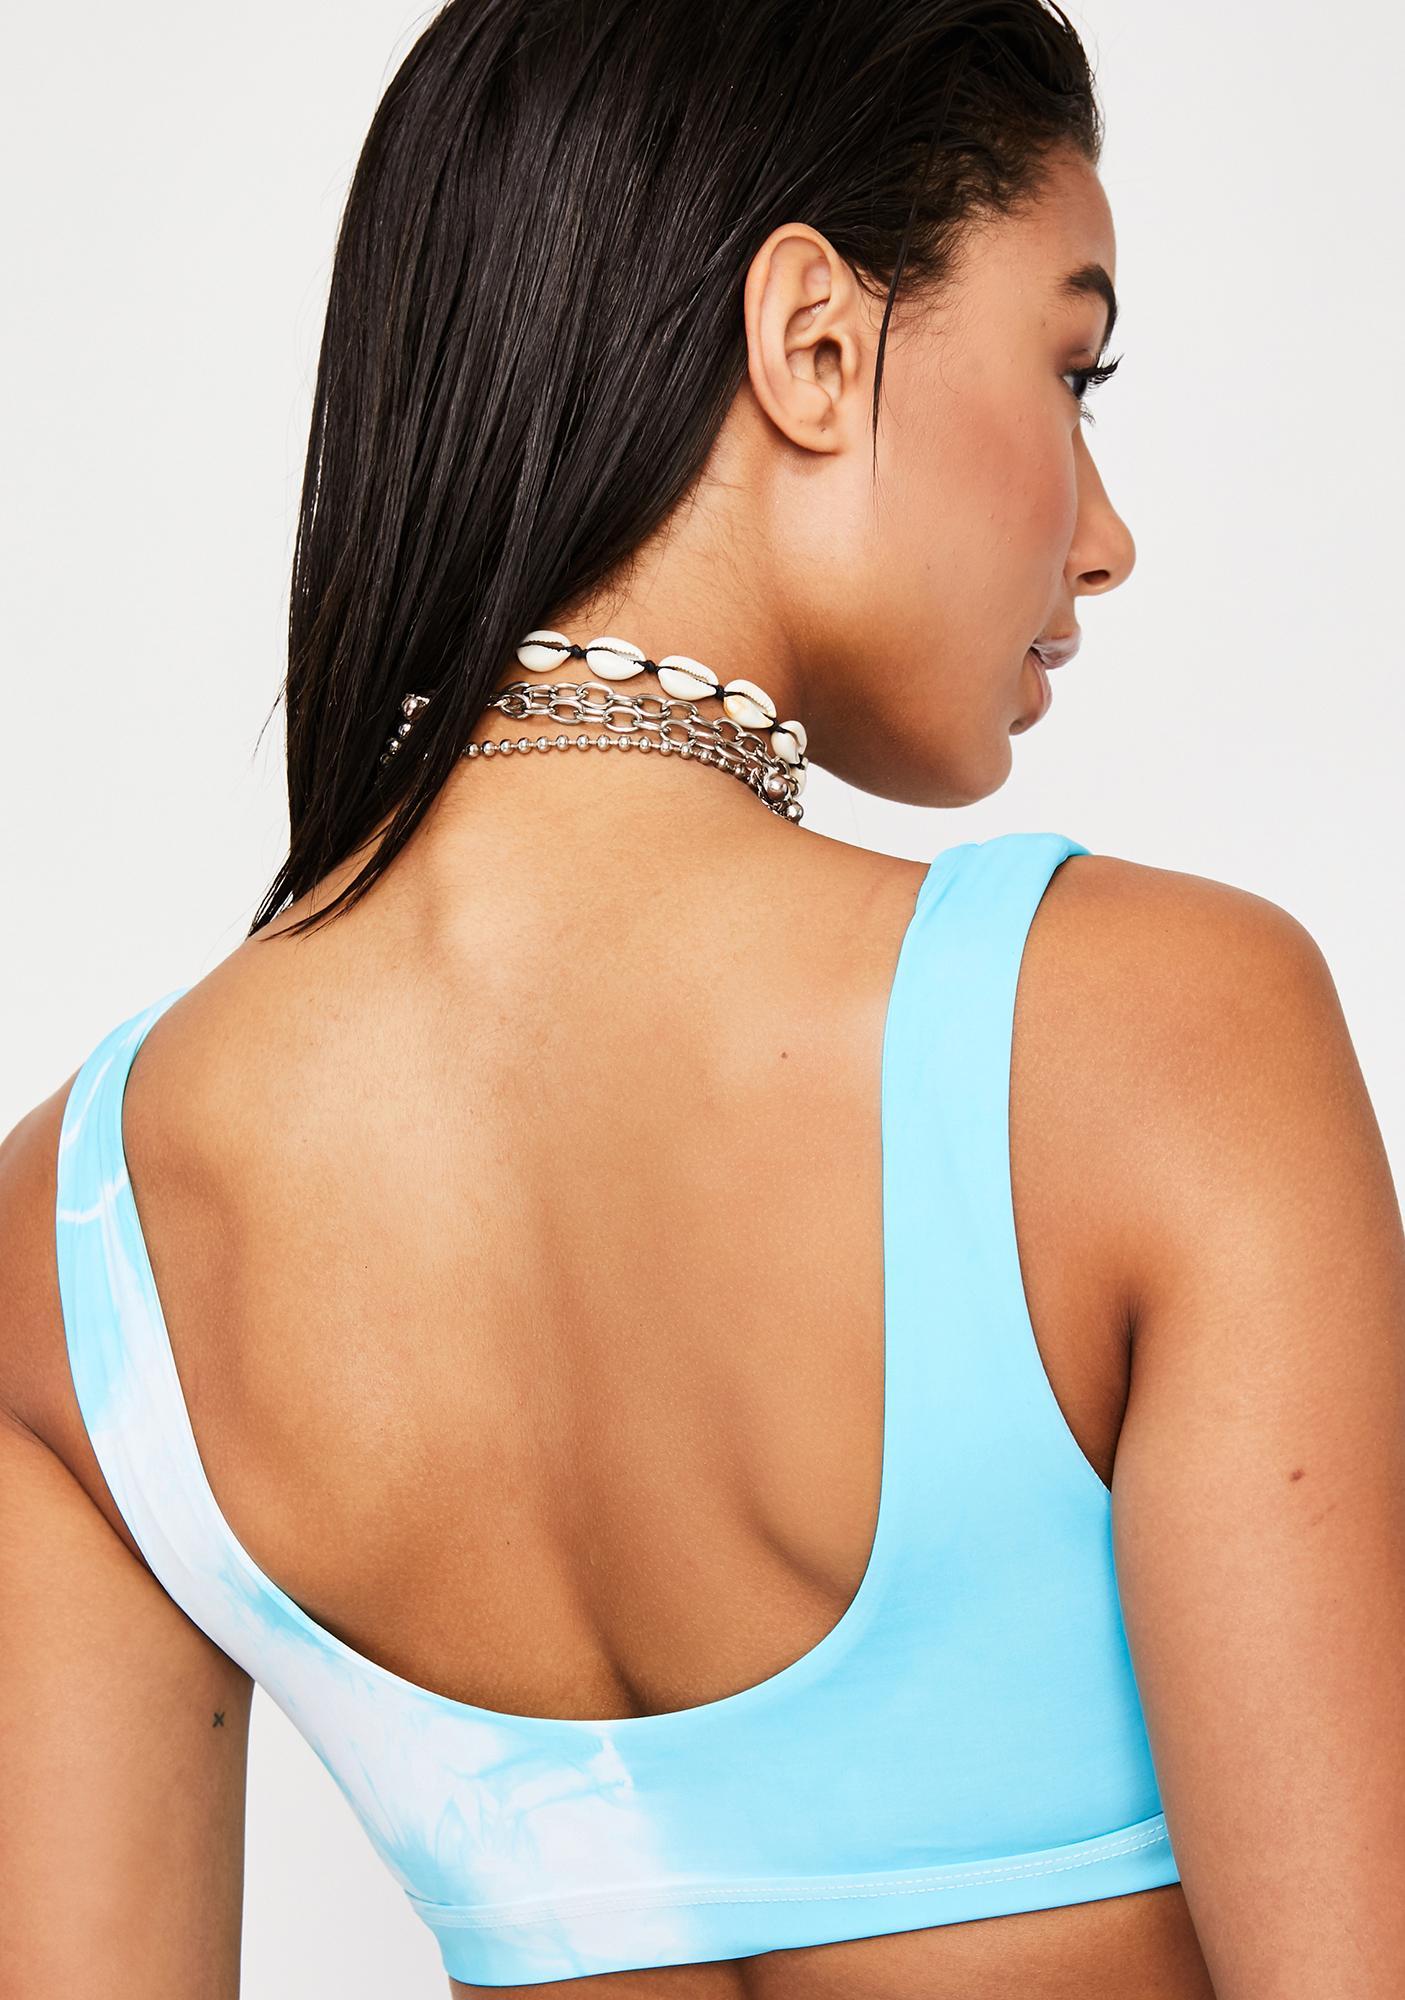 Dippin' Daisy's Crystal Seamless Sports Bra Bikini Top